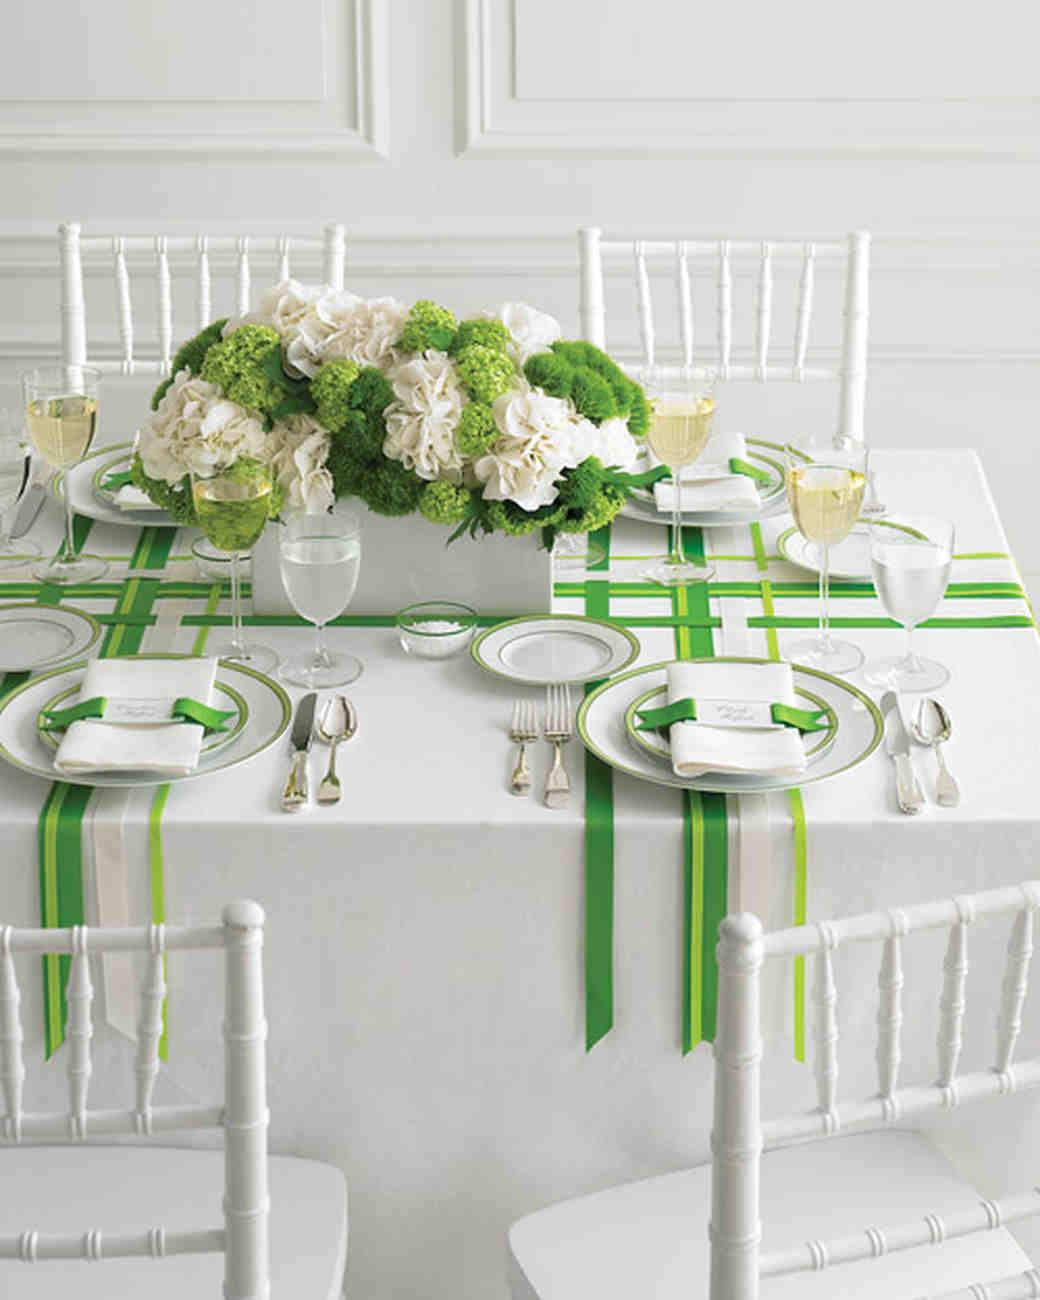 Ribbon-Weave Tabletop & Wedding Colors: Green and White   Martha Stewart Weddings